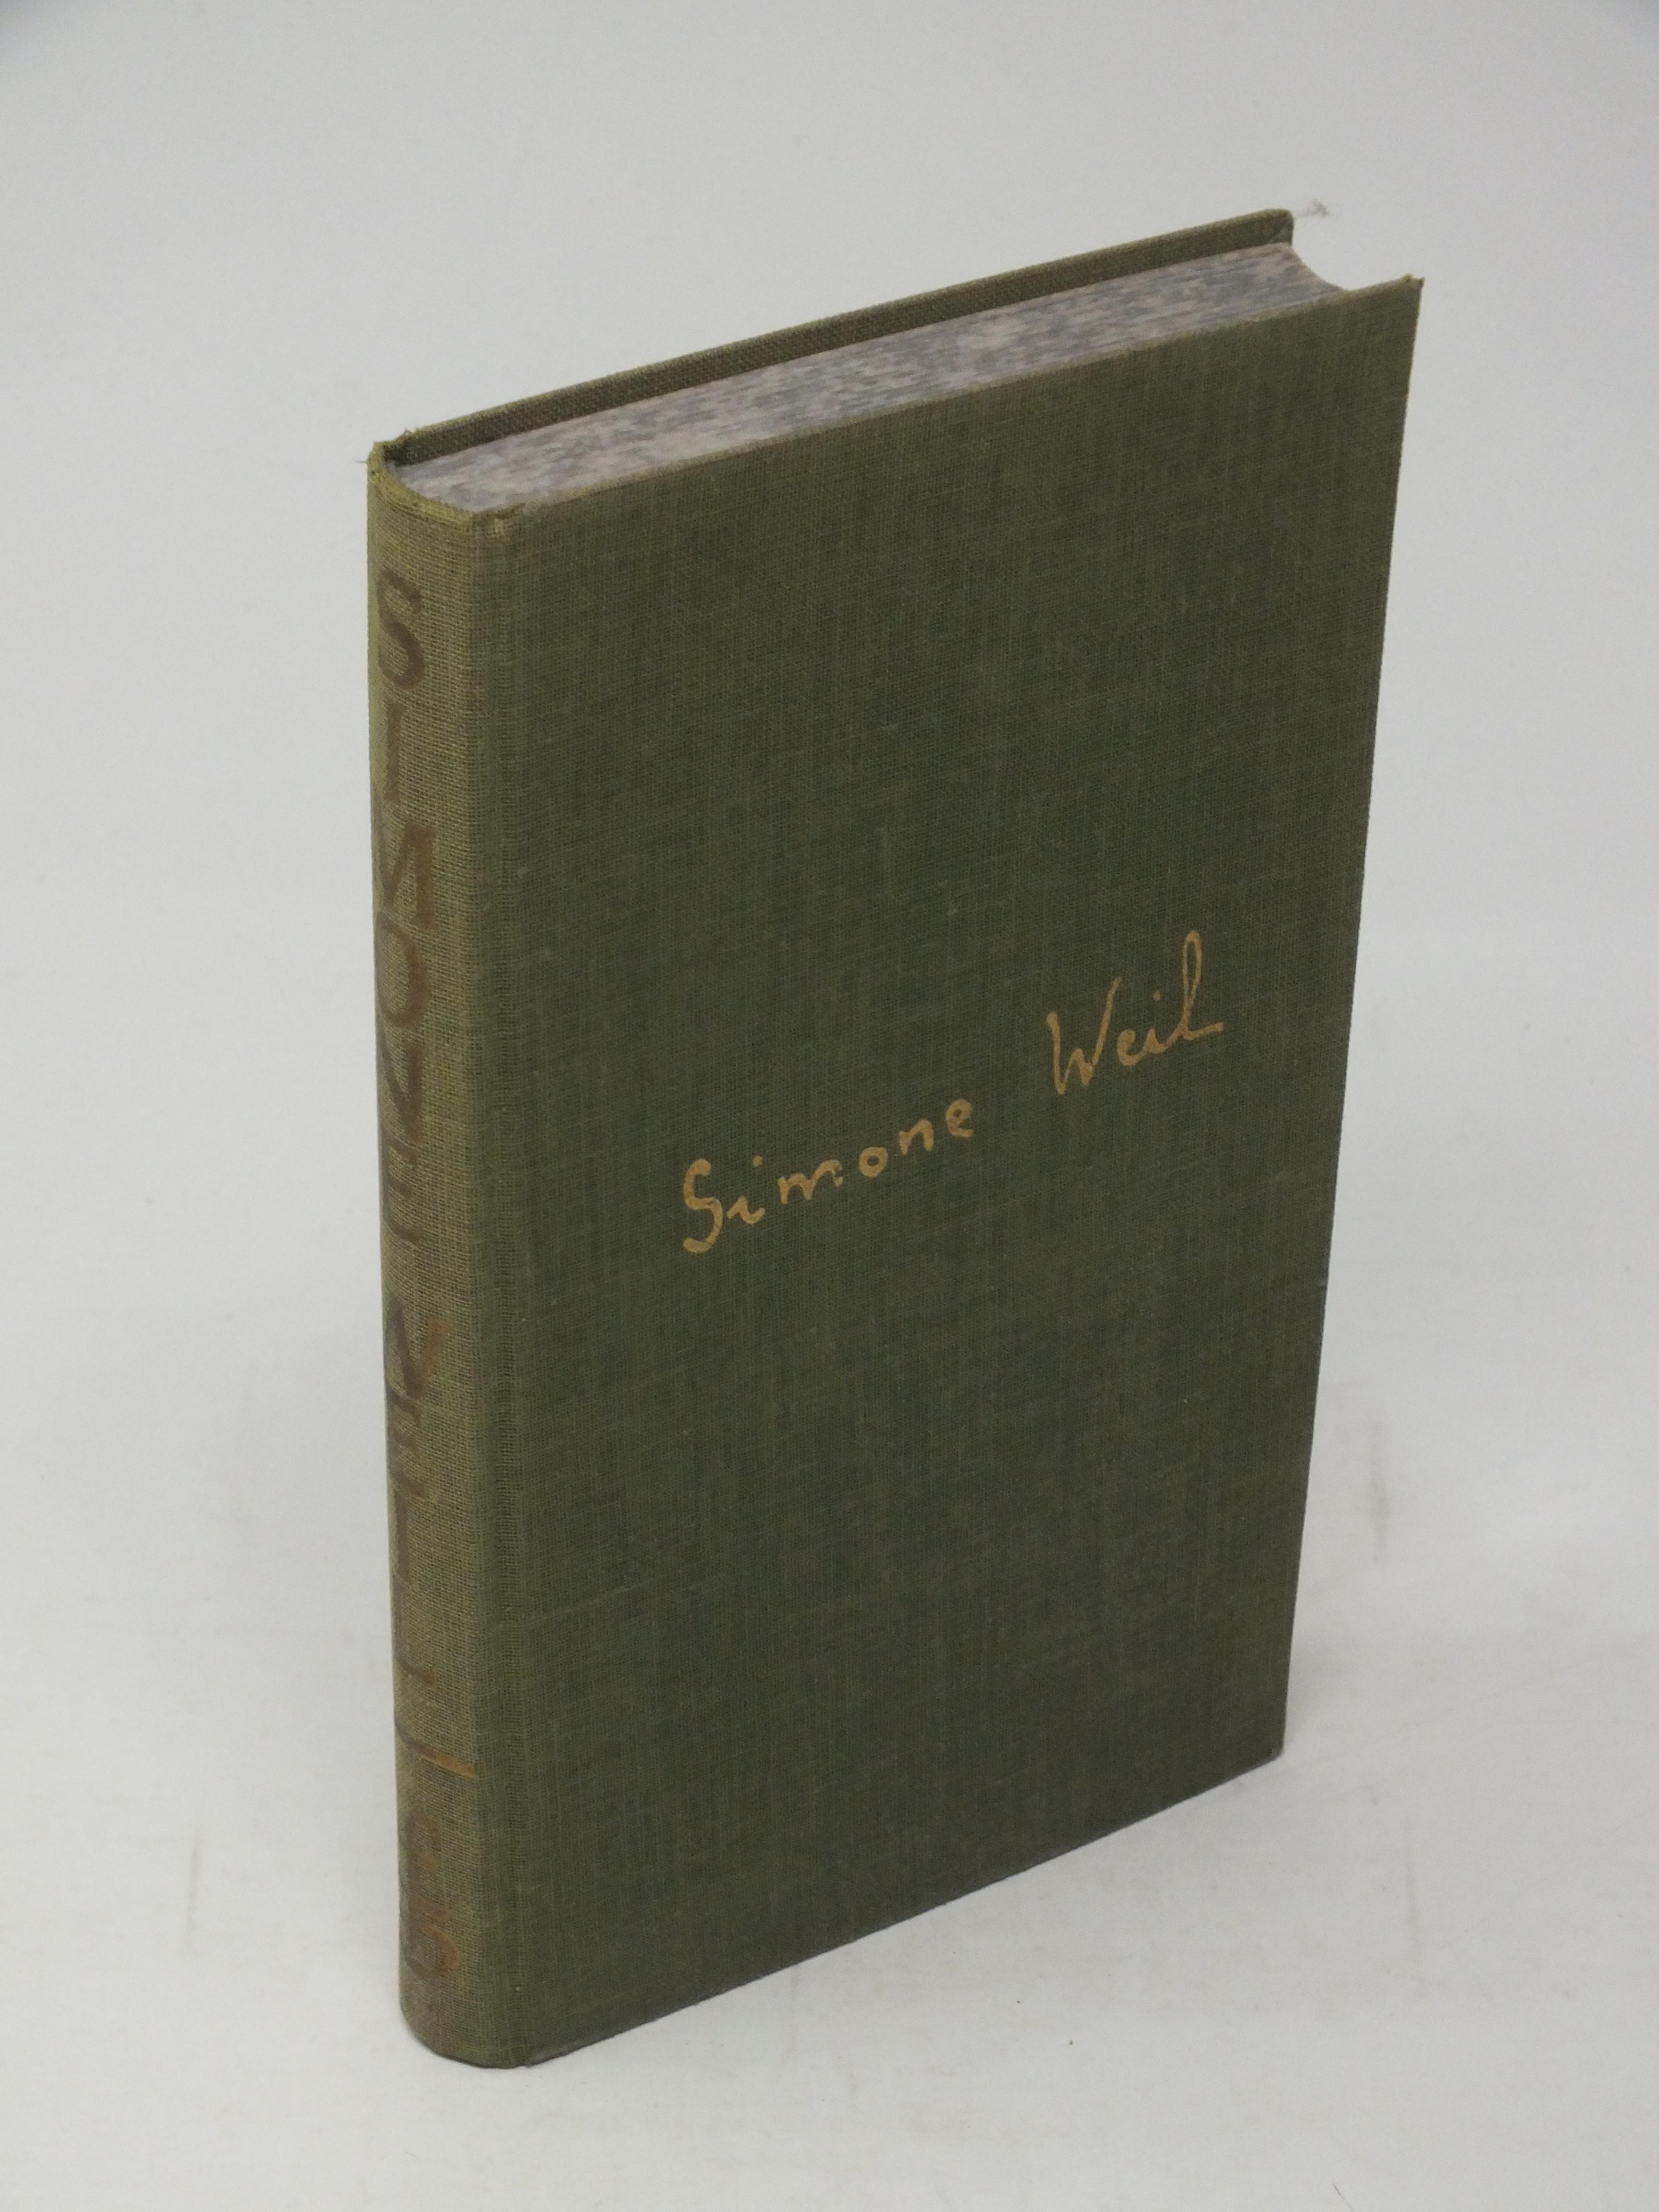 Wir kannten Simone Weil - Perrin, J.-M.; Thibon, G.